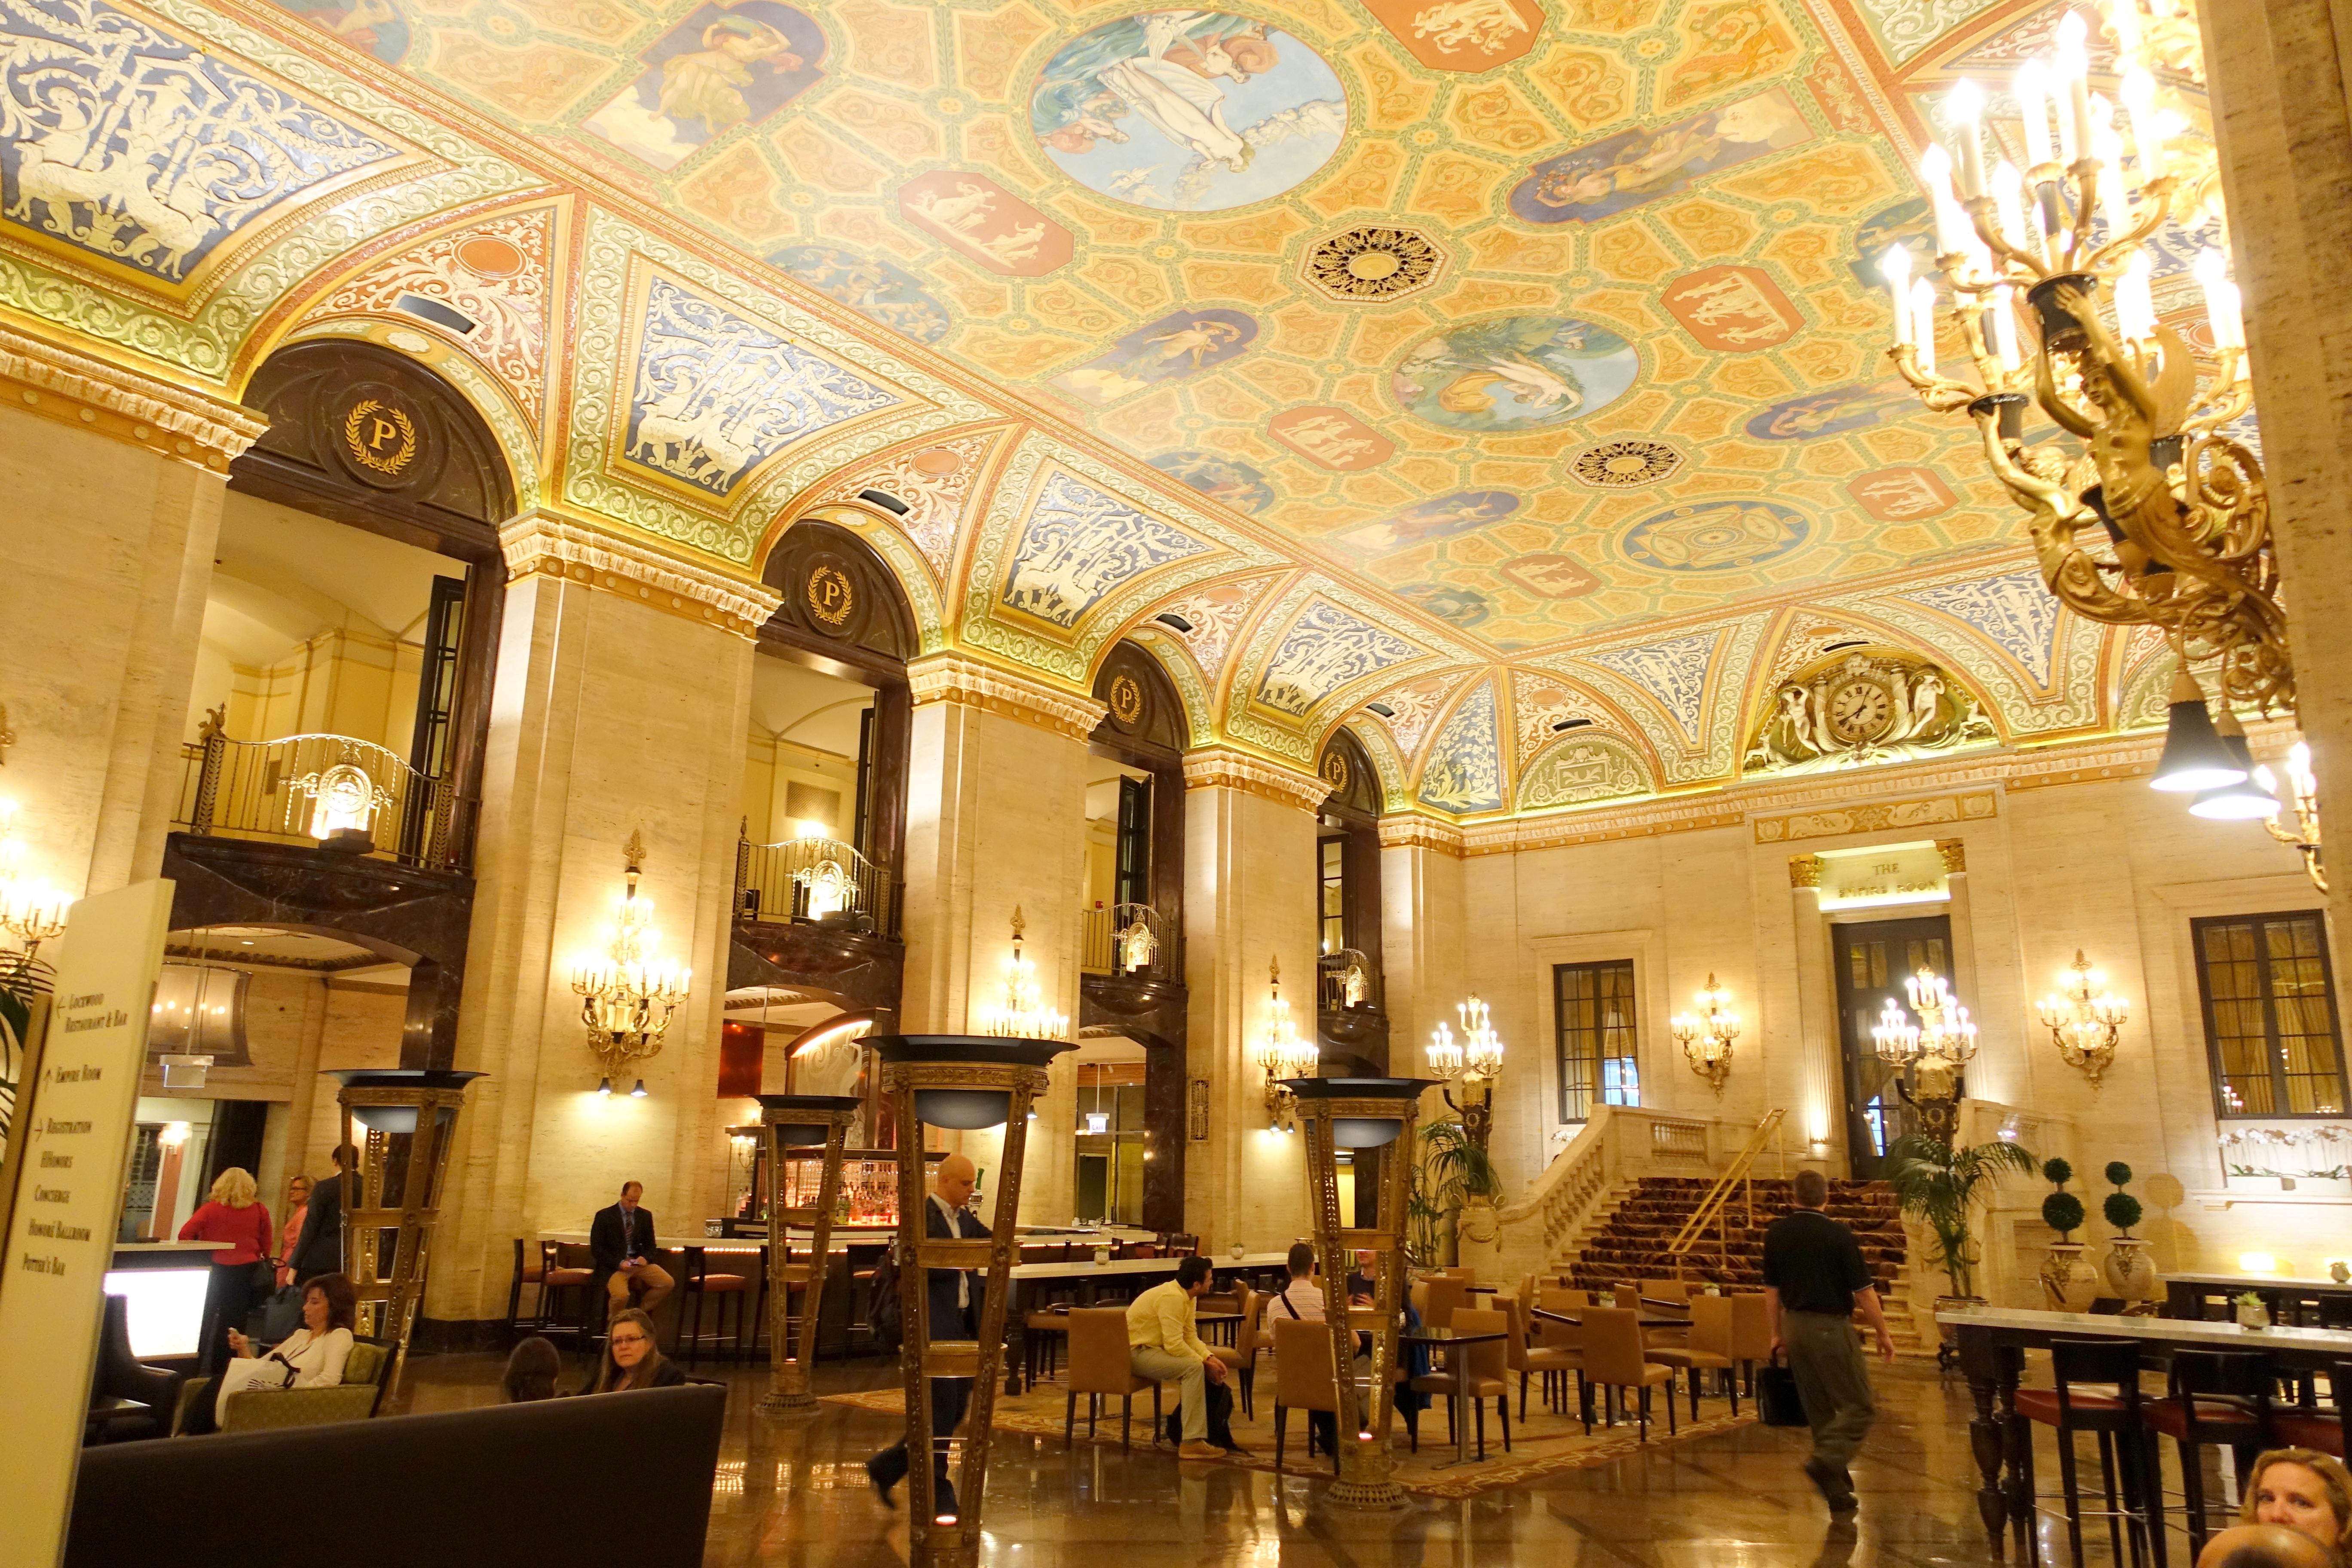 The Historic Palmer House Hotel lobby